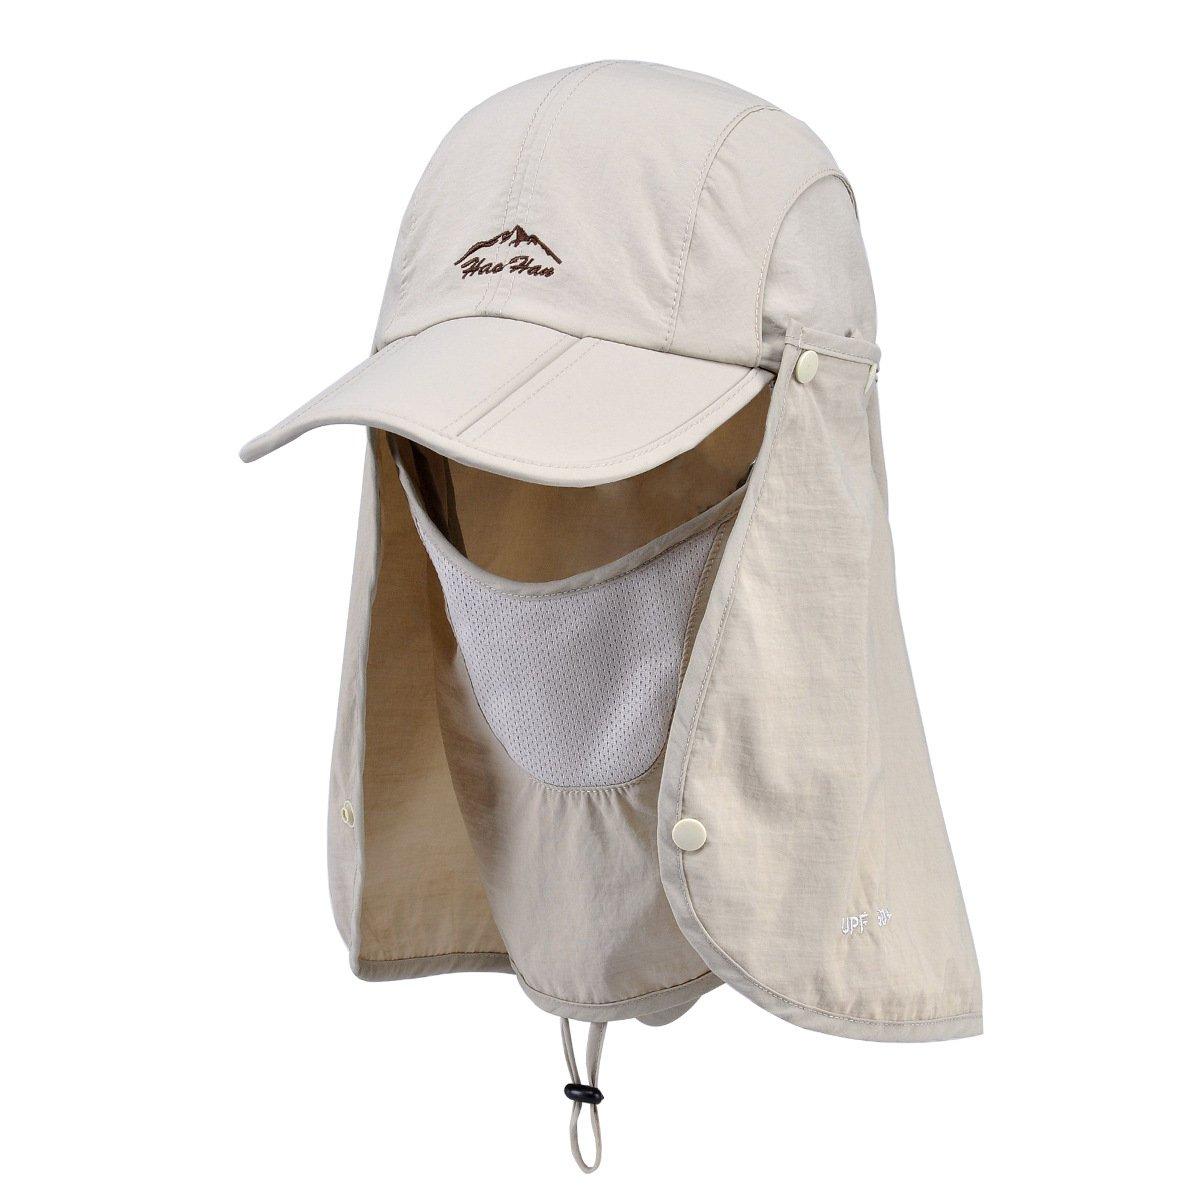 Belsen UPF 50+ Summer Hat Neck Protection Flap Cap (Khaki) by Belsen